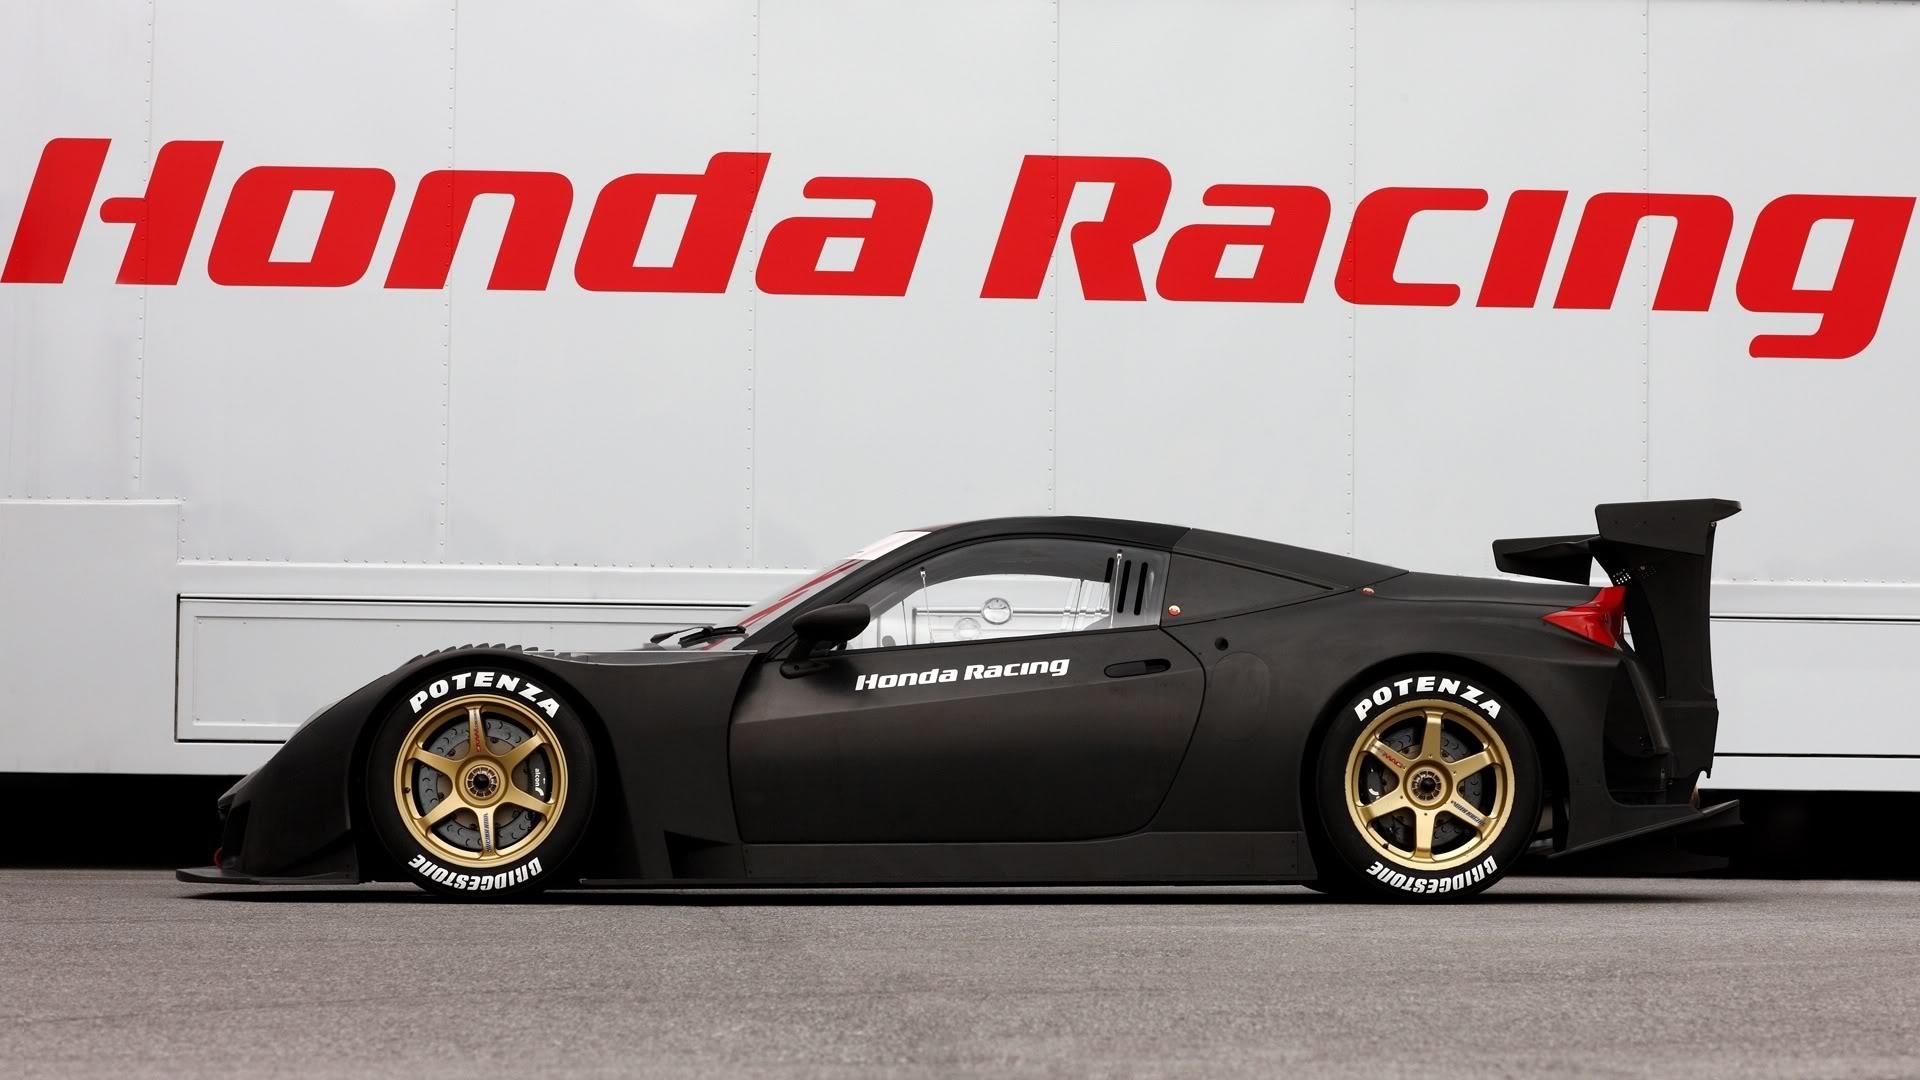 Honda Racing 1080 R32taka